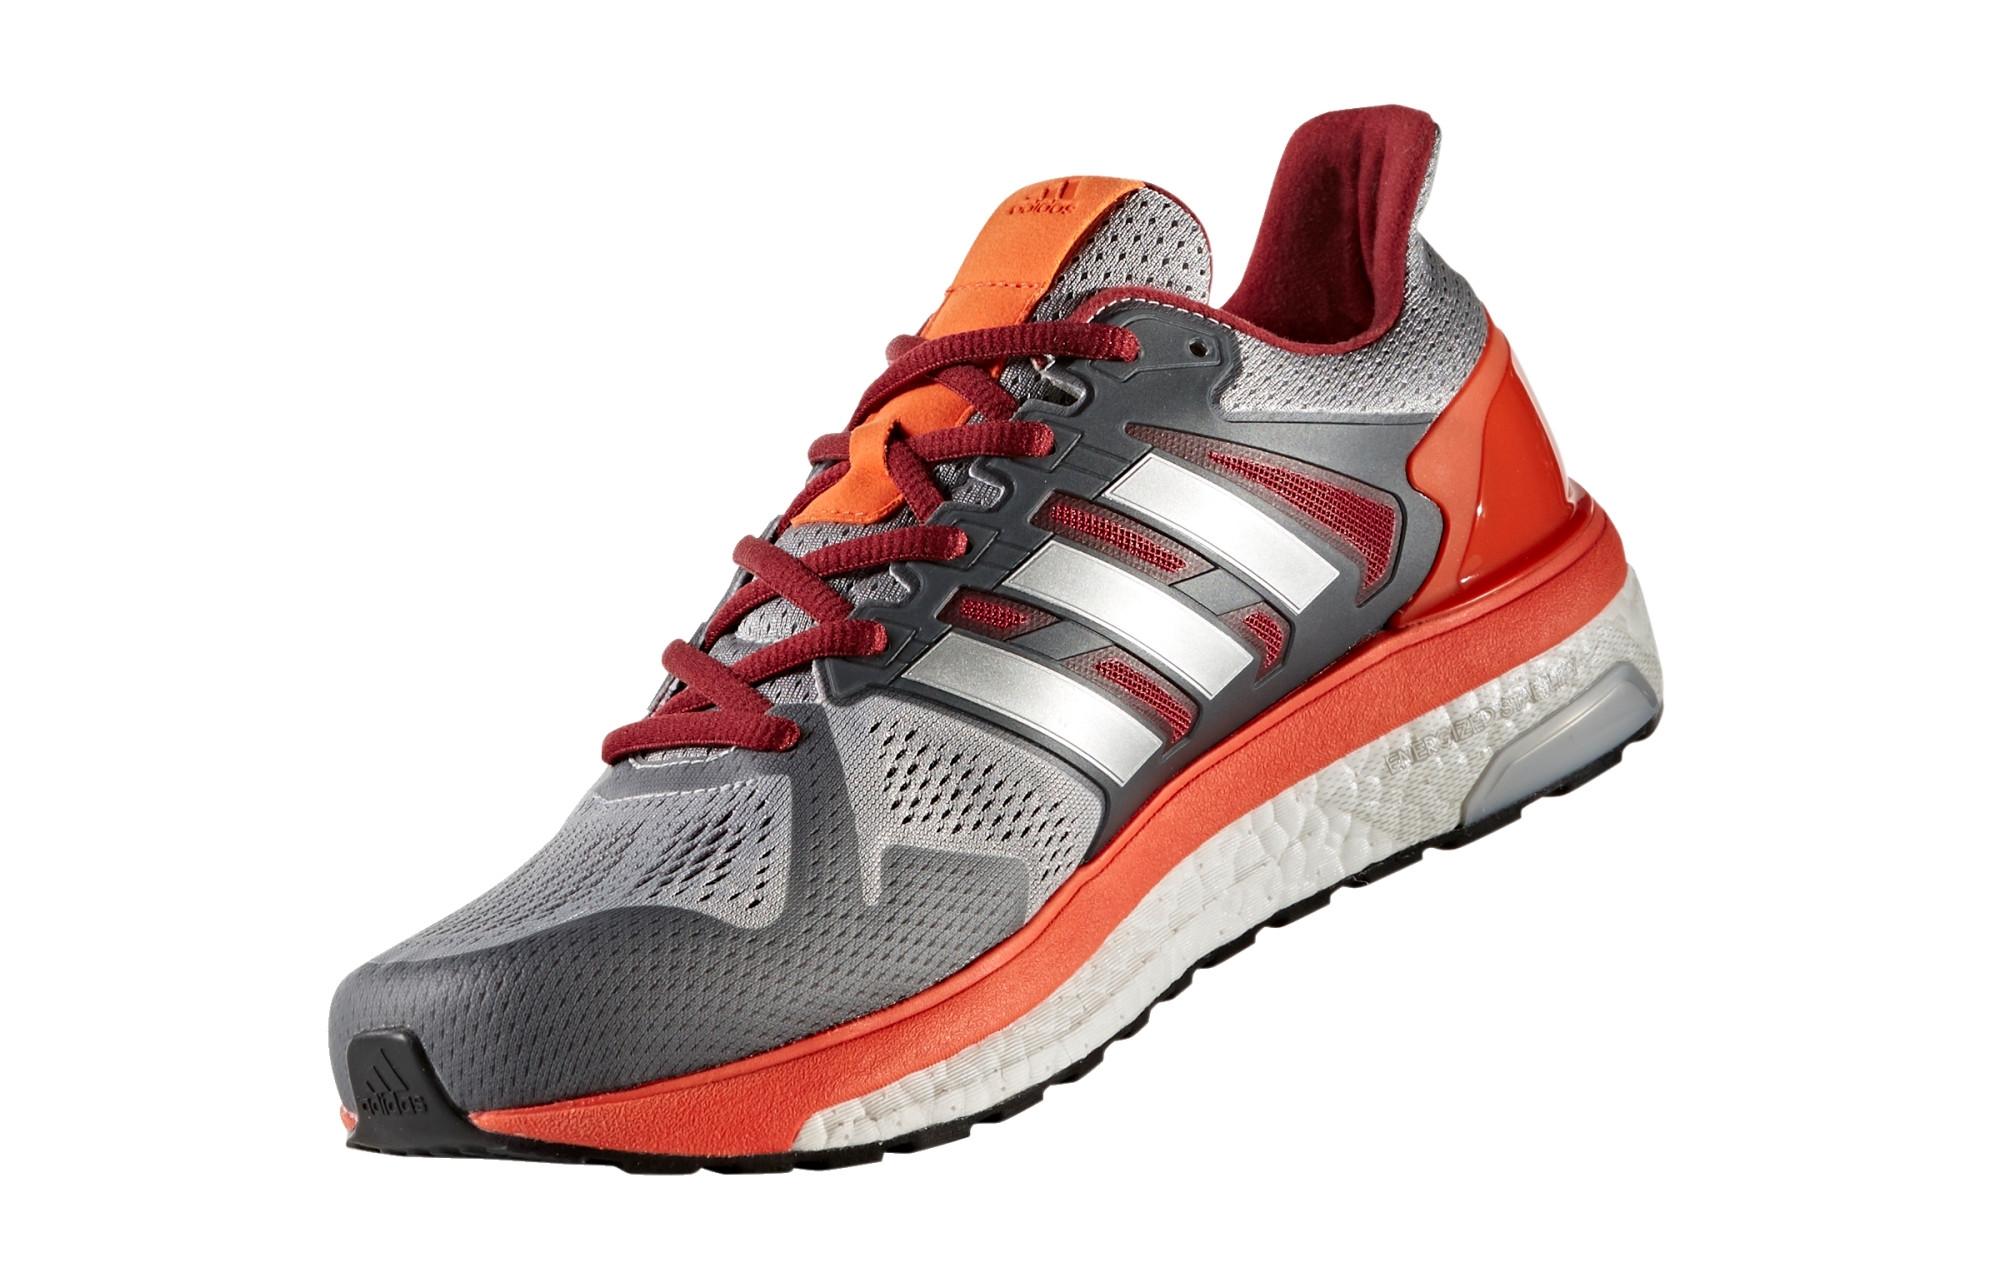 015d9ae69da94 Chaussures de Running adidas running Supernova ST Gris   Orange ...